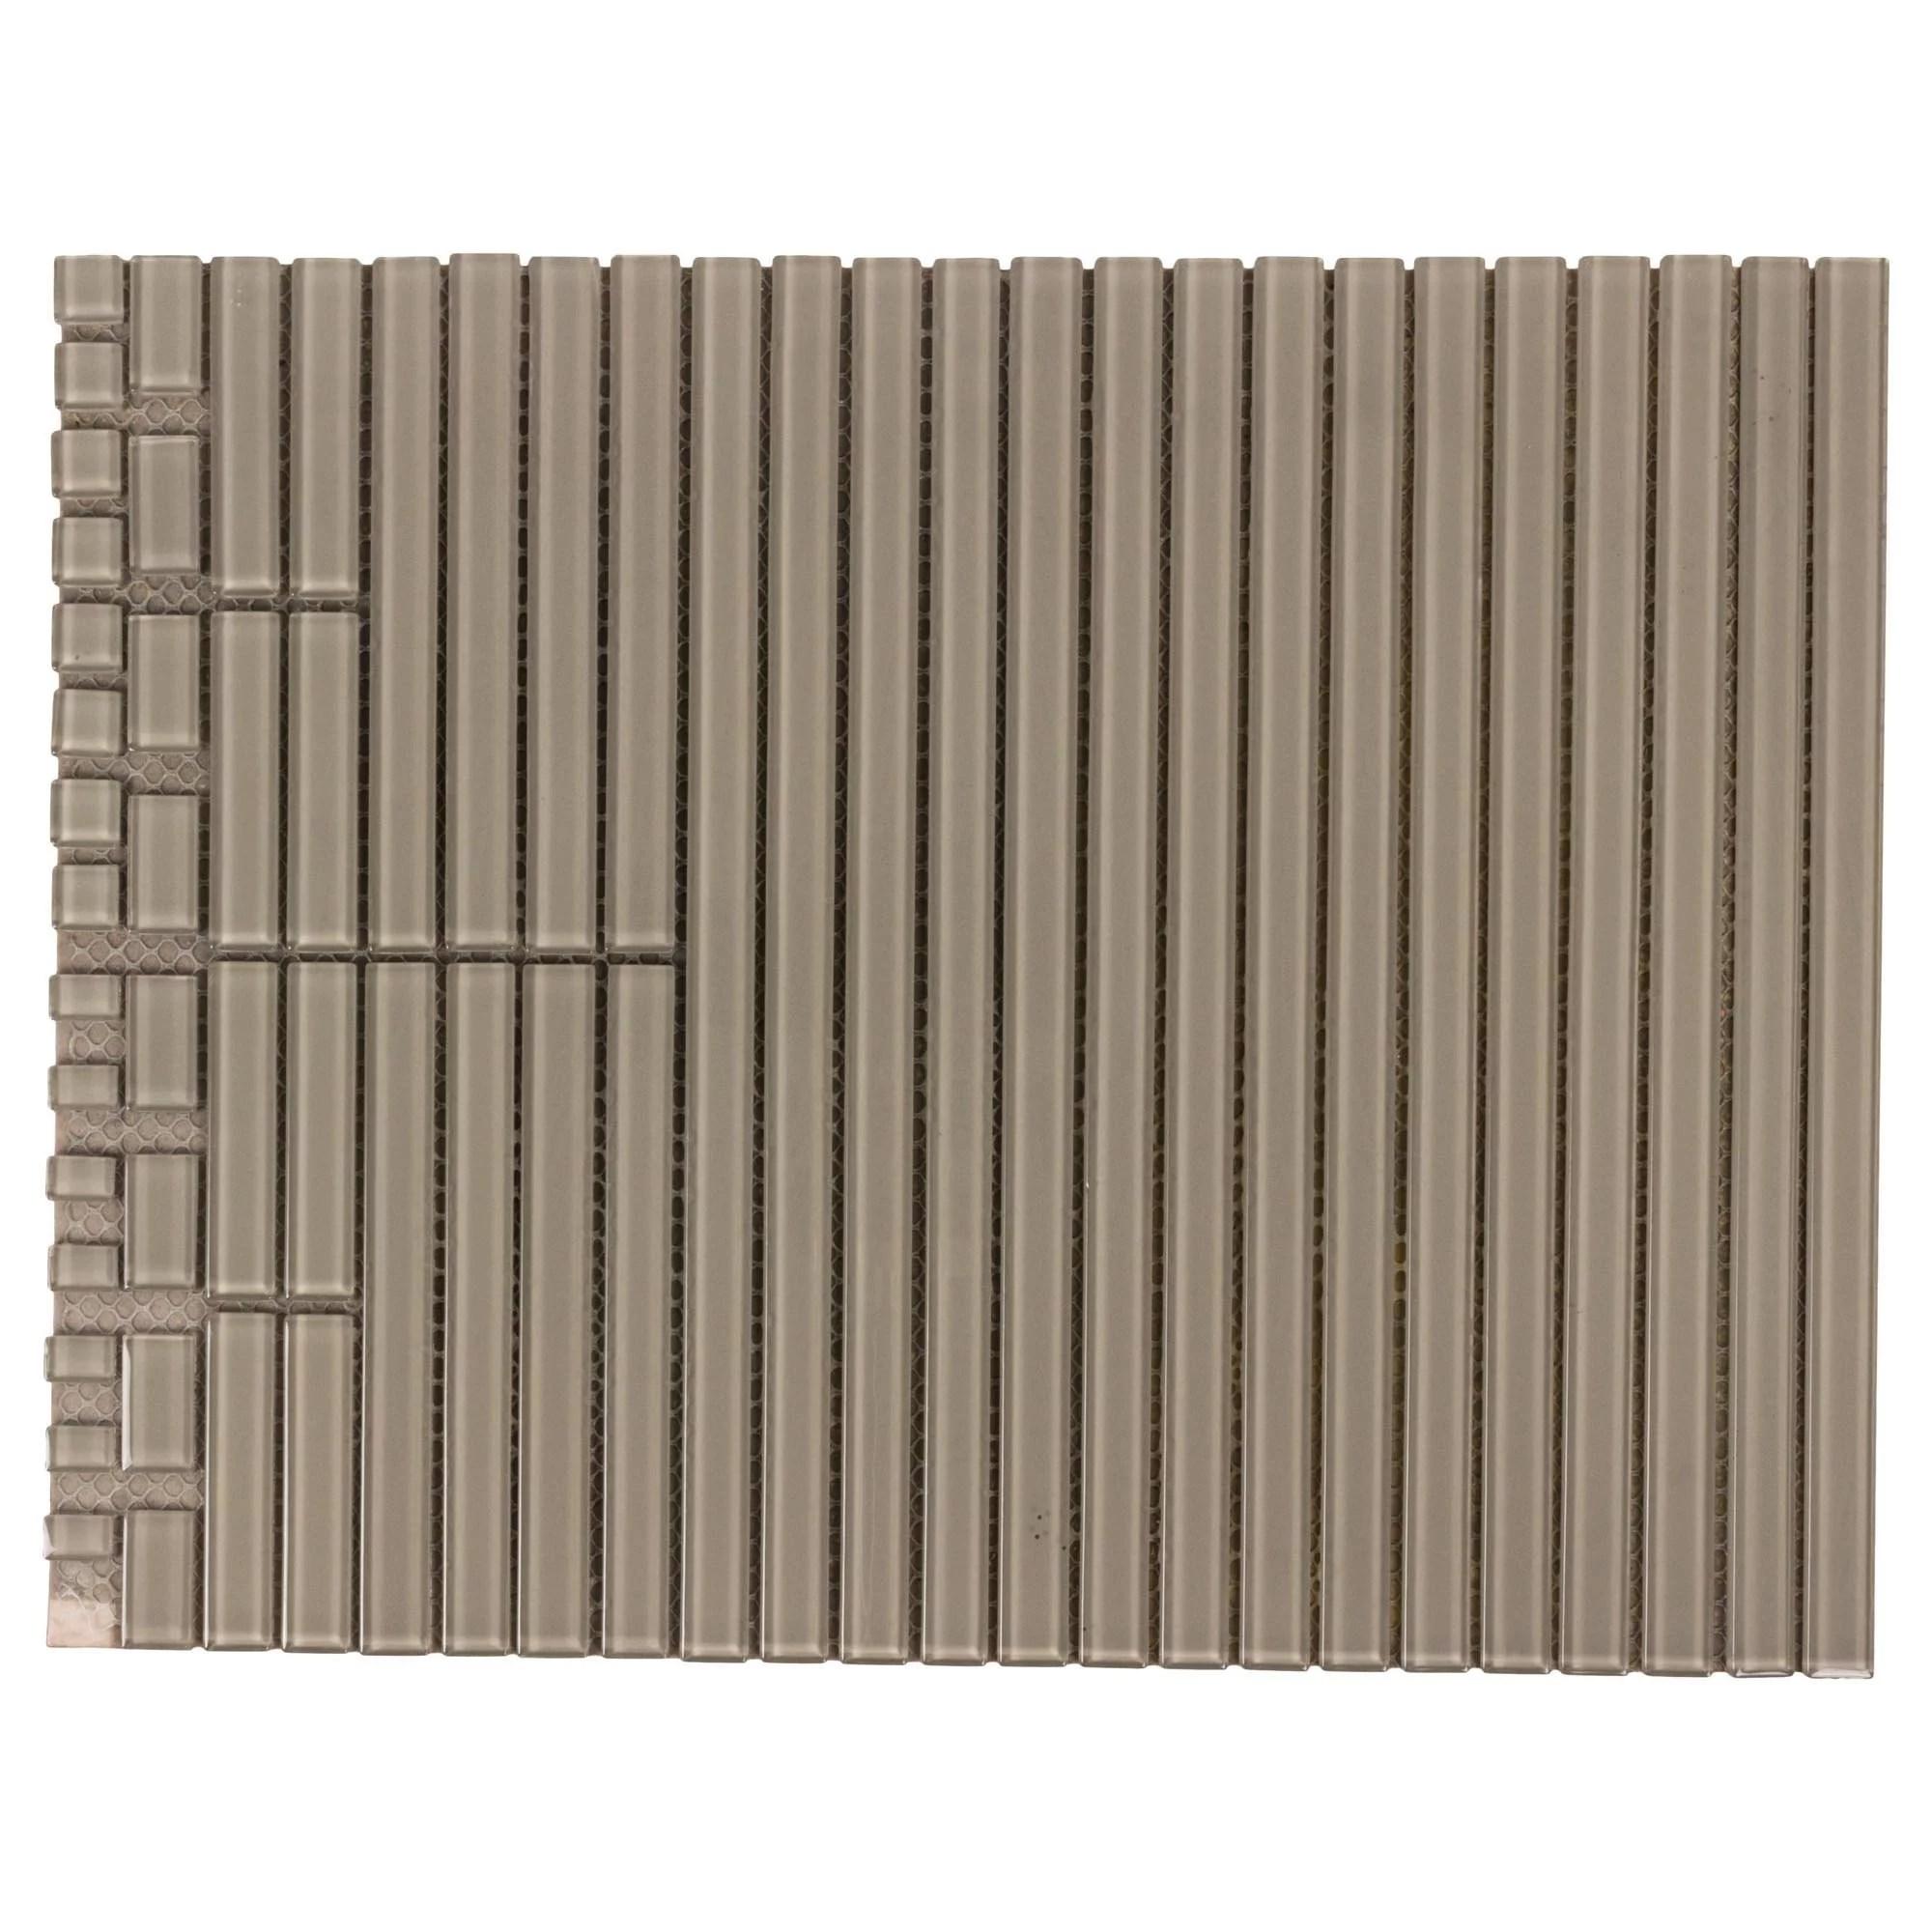 mto0433 peel and stick modern liner molding beige glossy glass mosaic tile walmart com walmart com